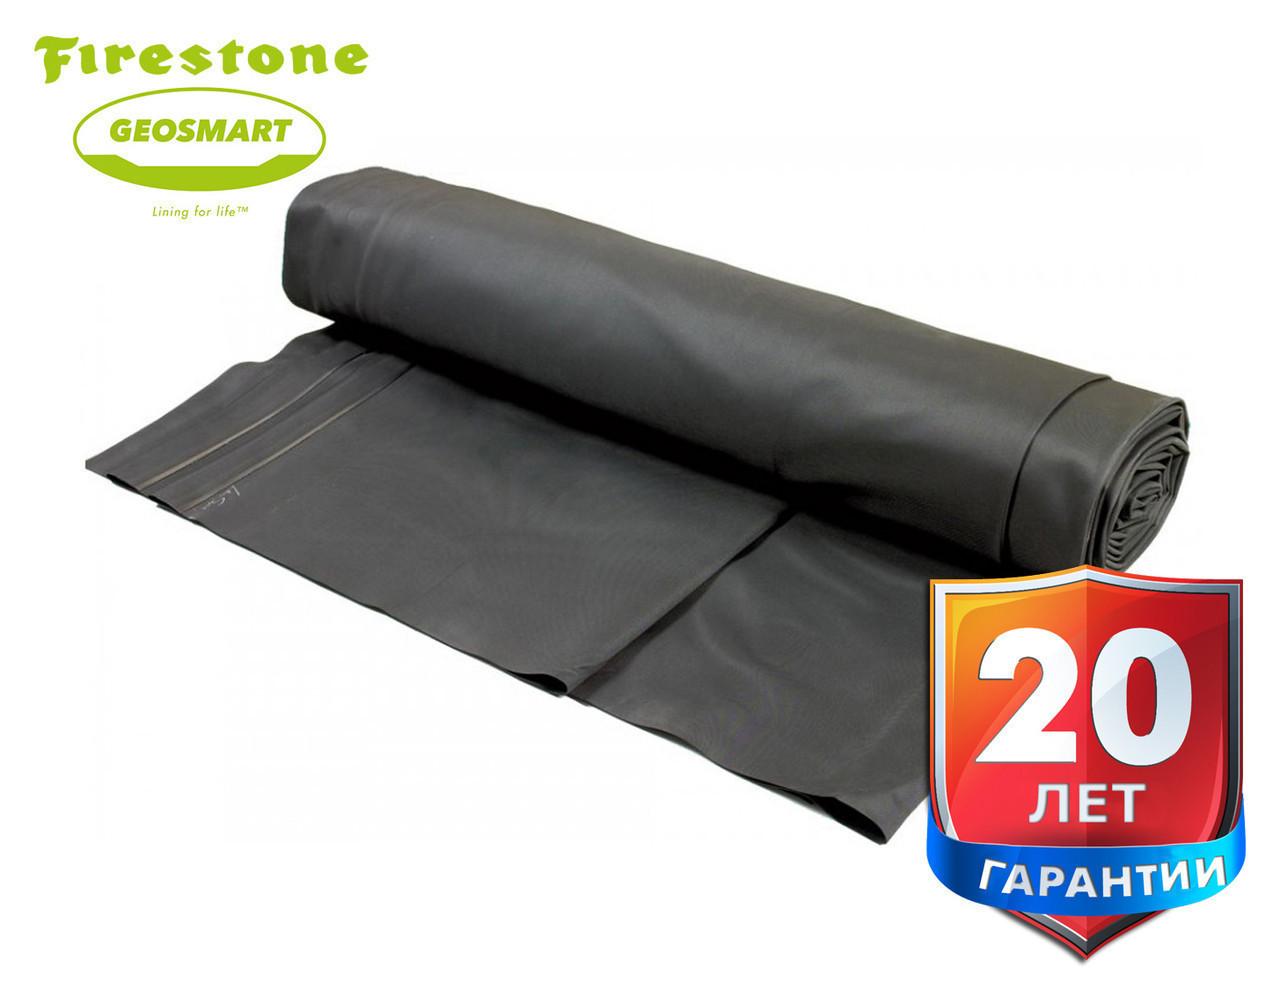 Бутилкаучукова плівка Firestone GeoSmart EPDM 0,8 мм ширина 15 м